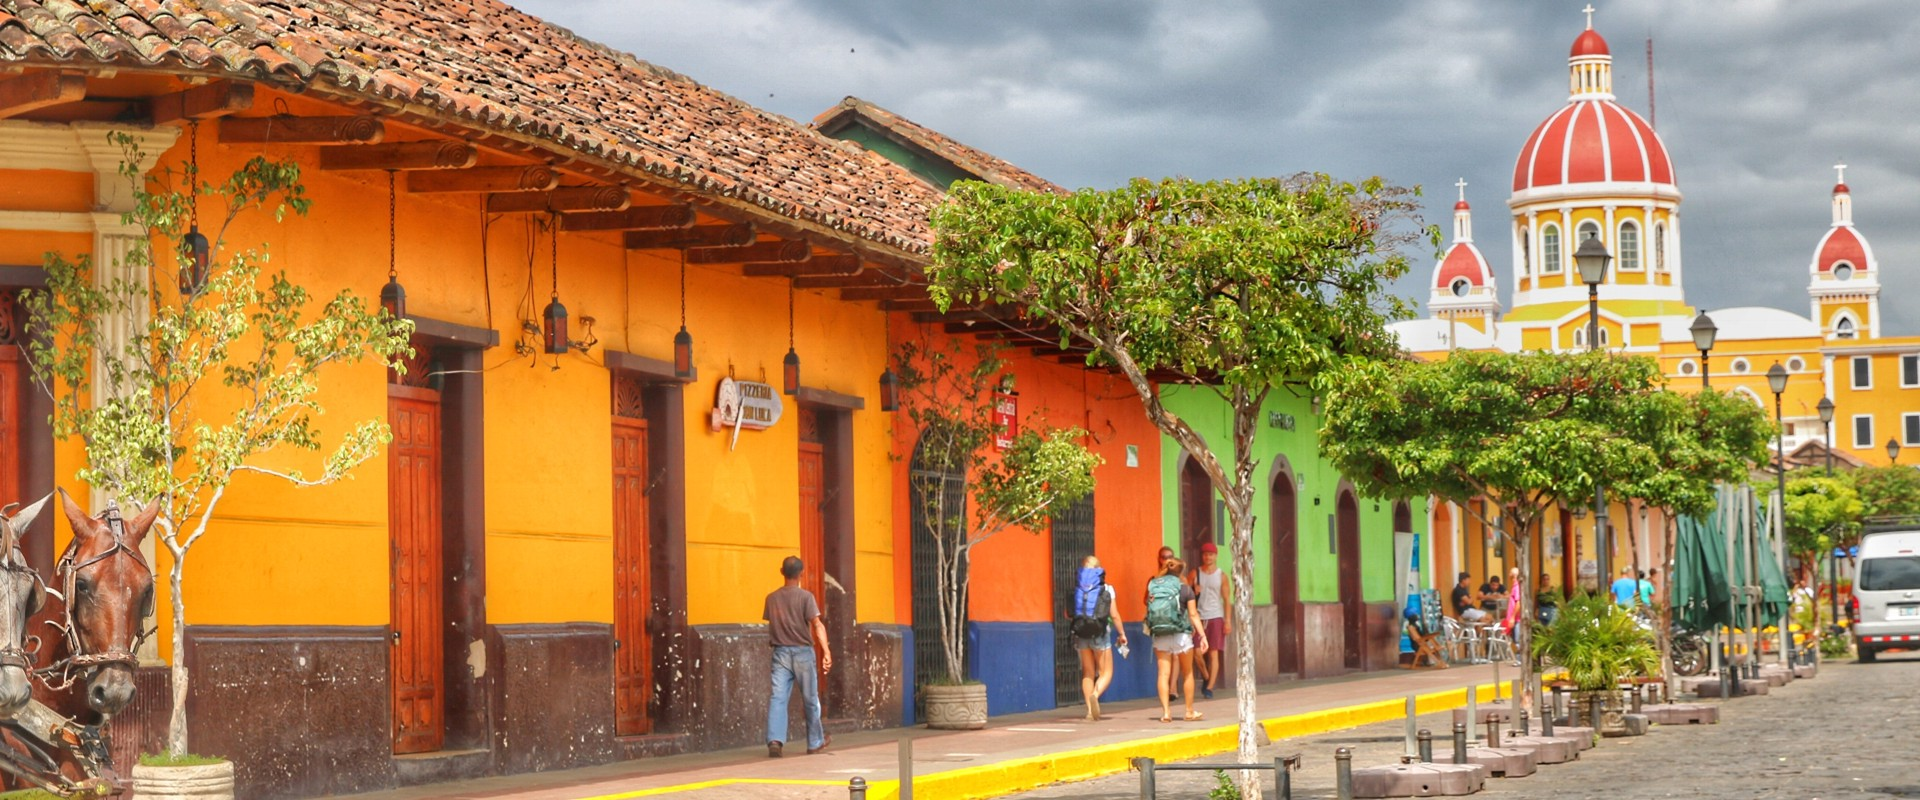 Nicaragua Inmigration Services